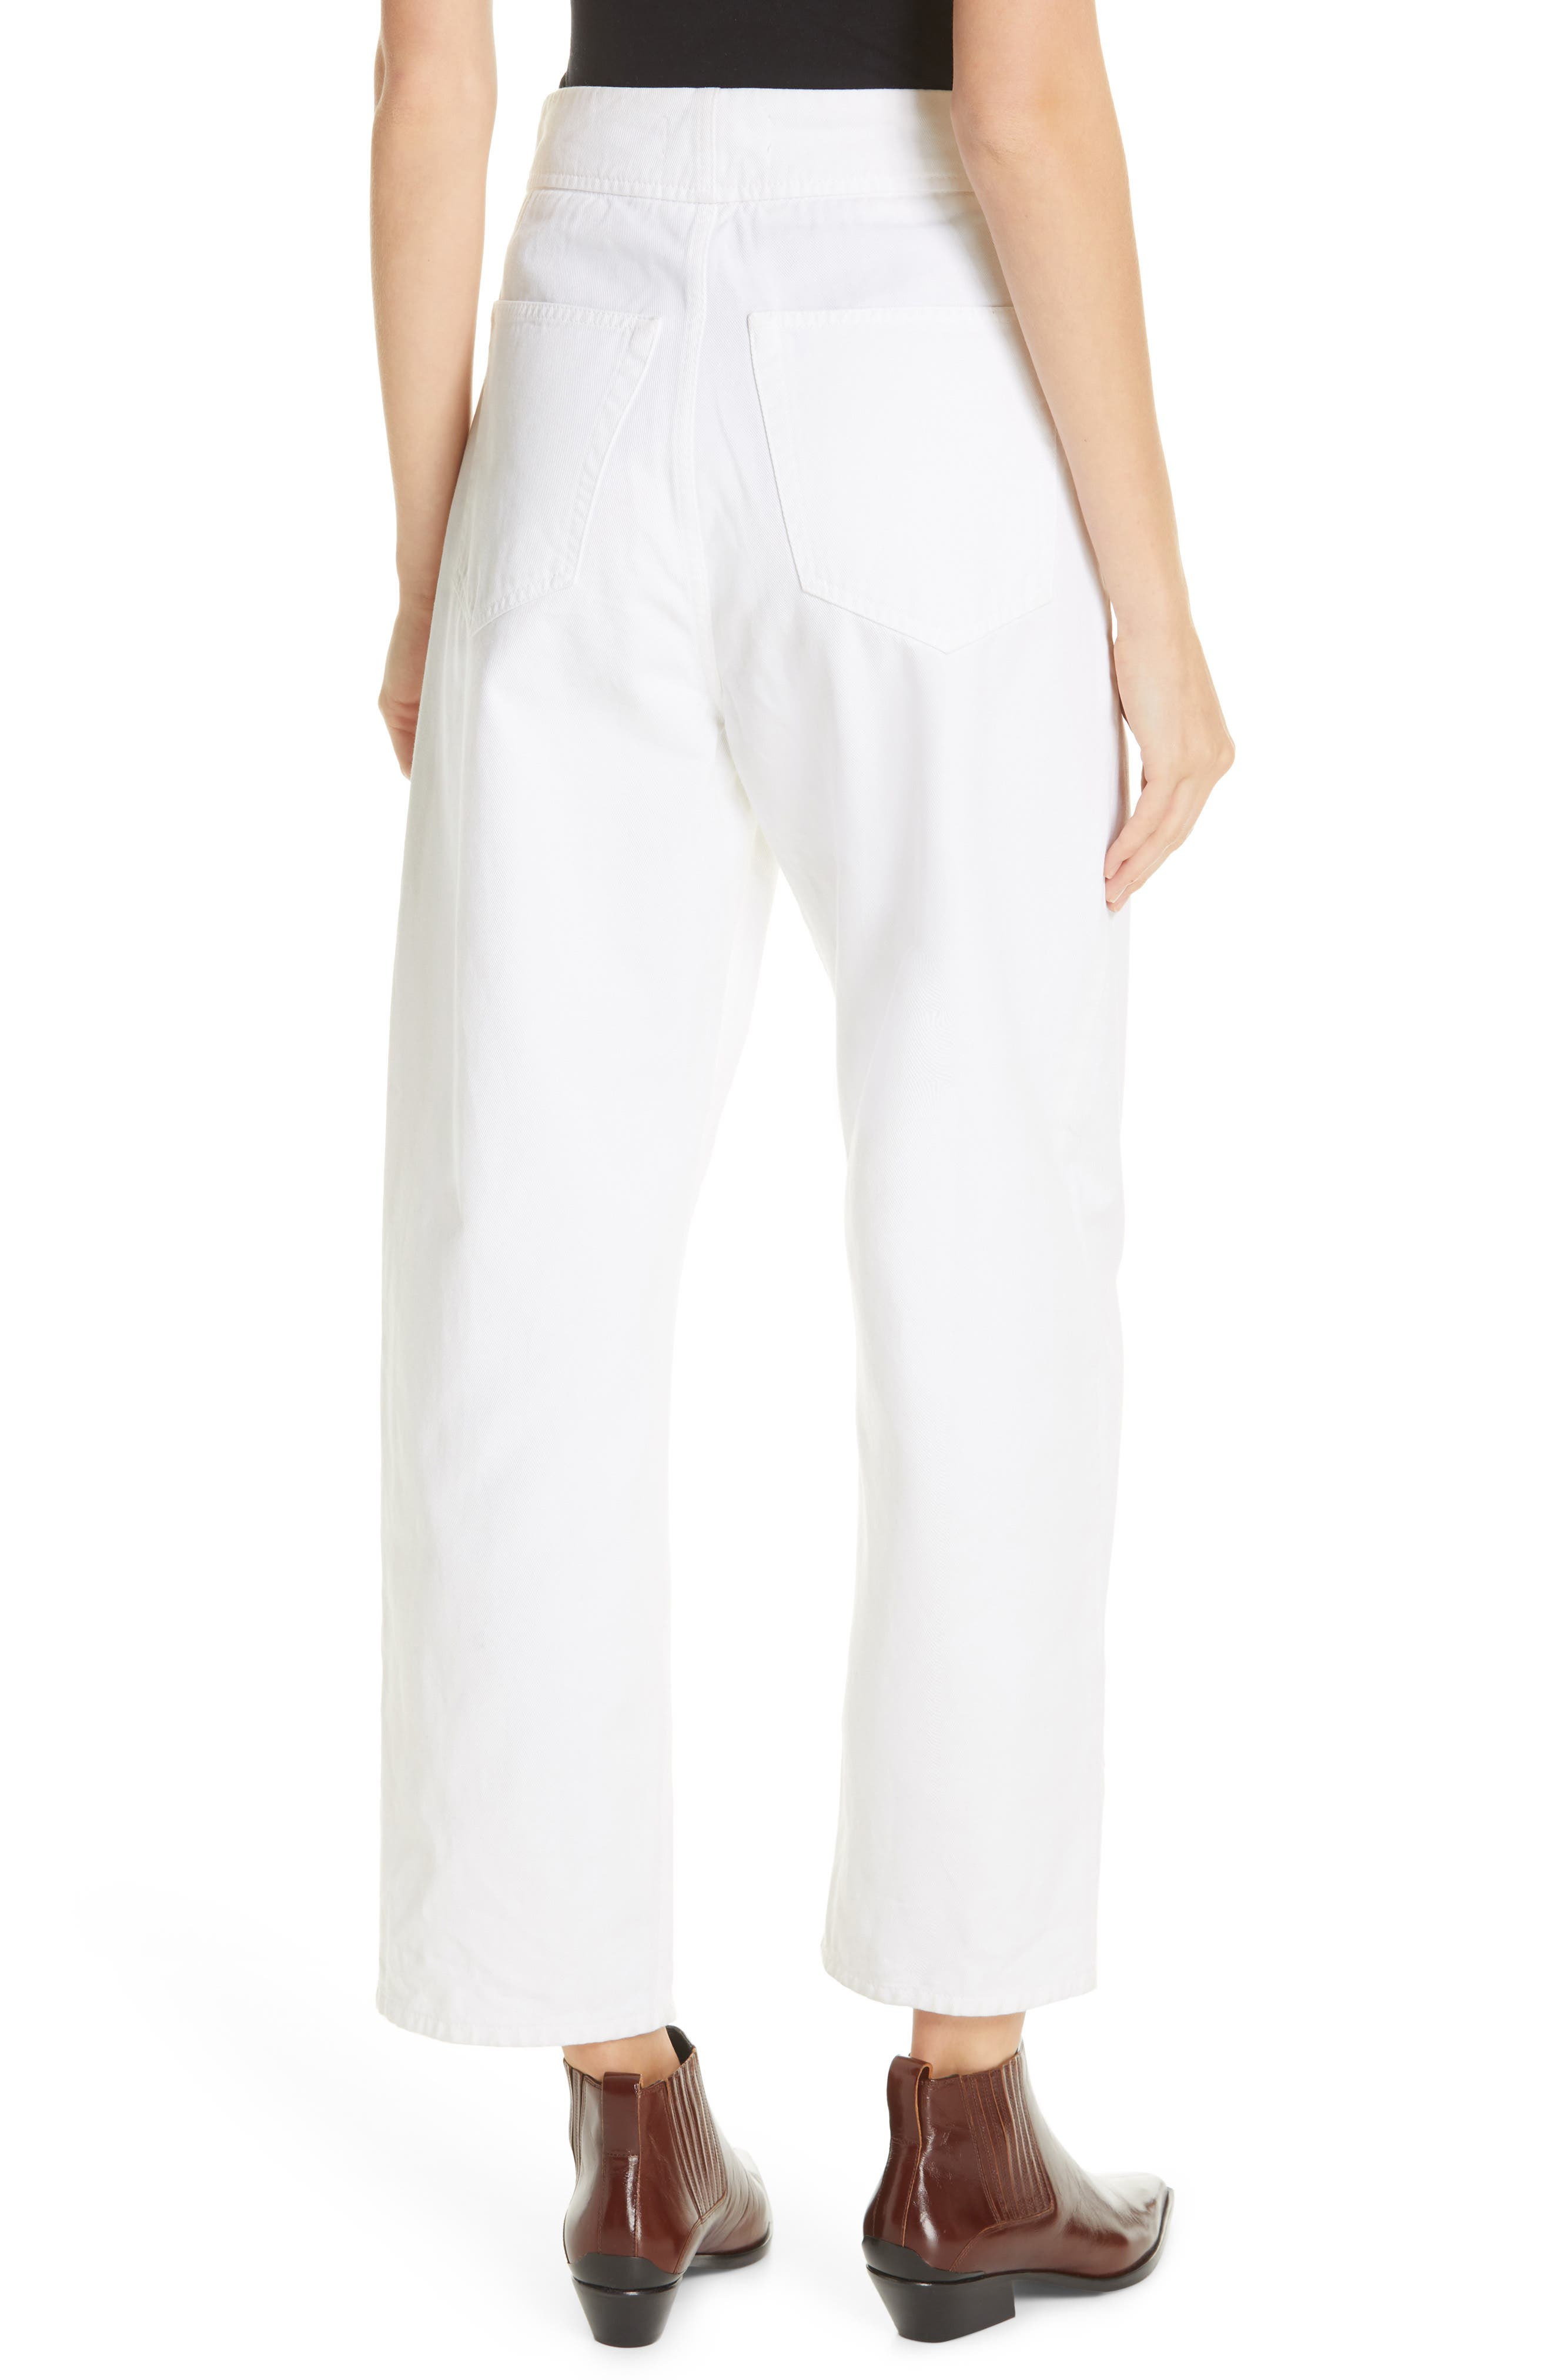 NILI LOTAN, Toledo Crop Cotton Pants, Alternate thumbnail 2, color, VINTAGE WHITE